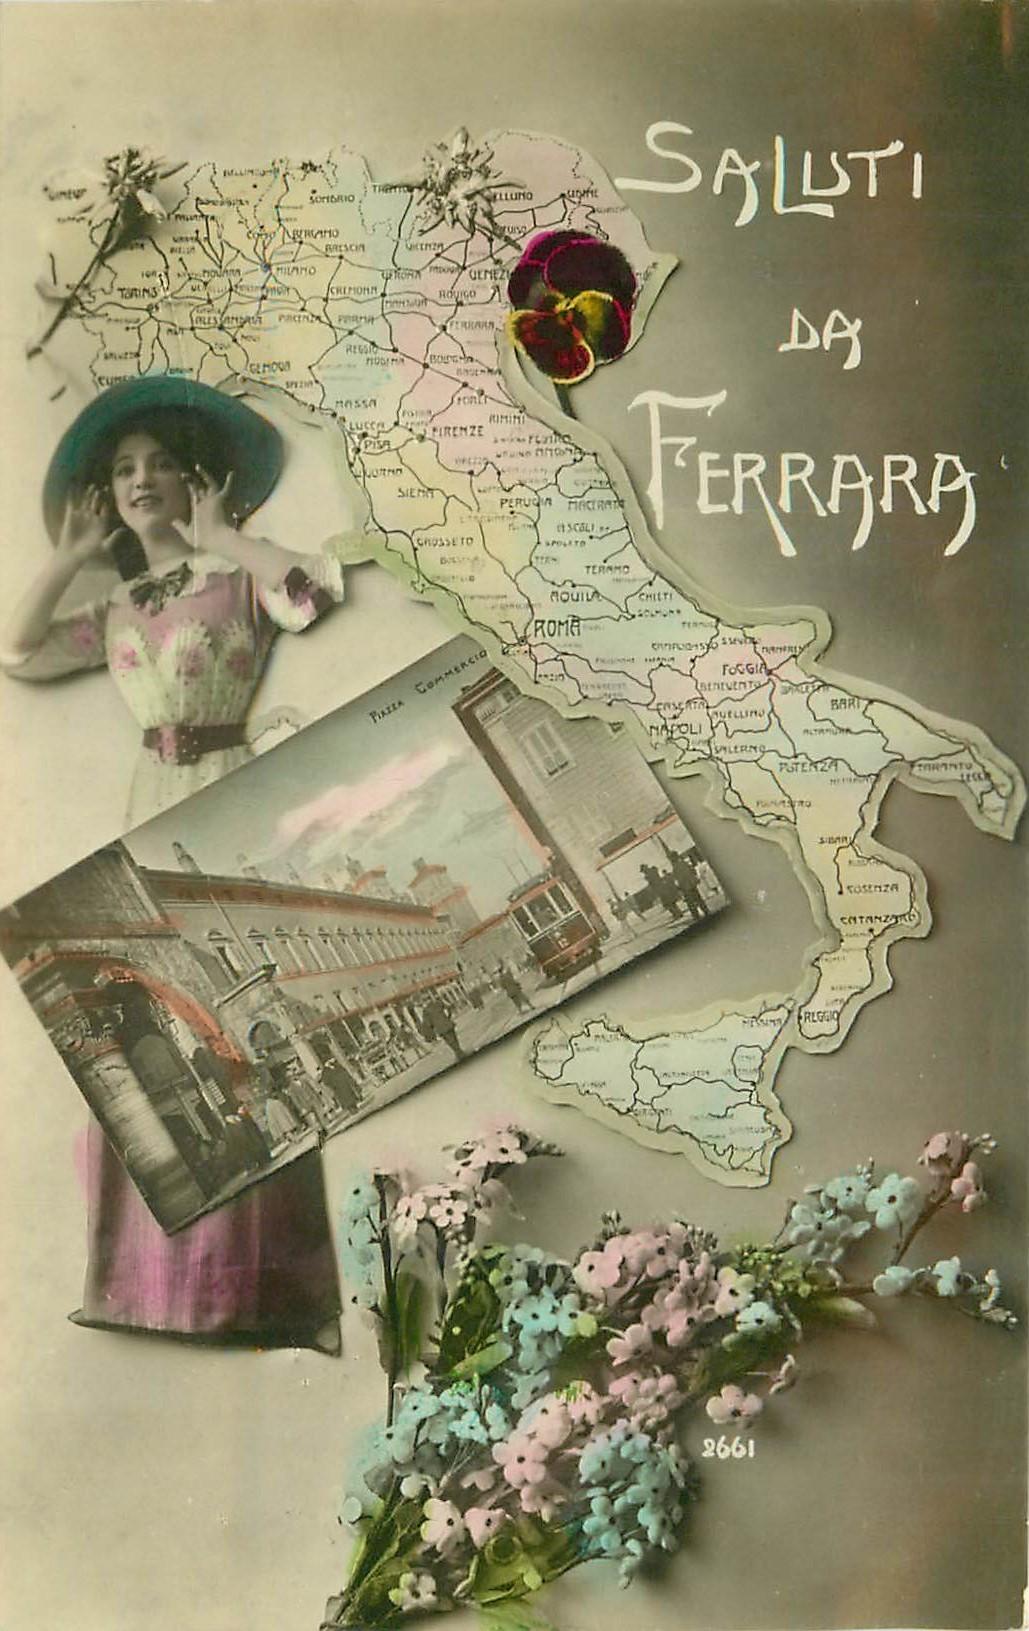 FERRARA. Saluti avec carte de l'Italie et Piazza Commercio